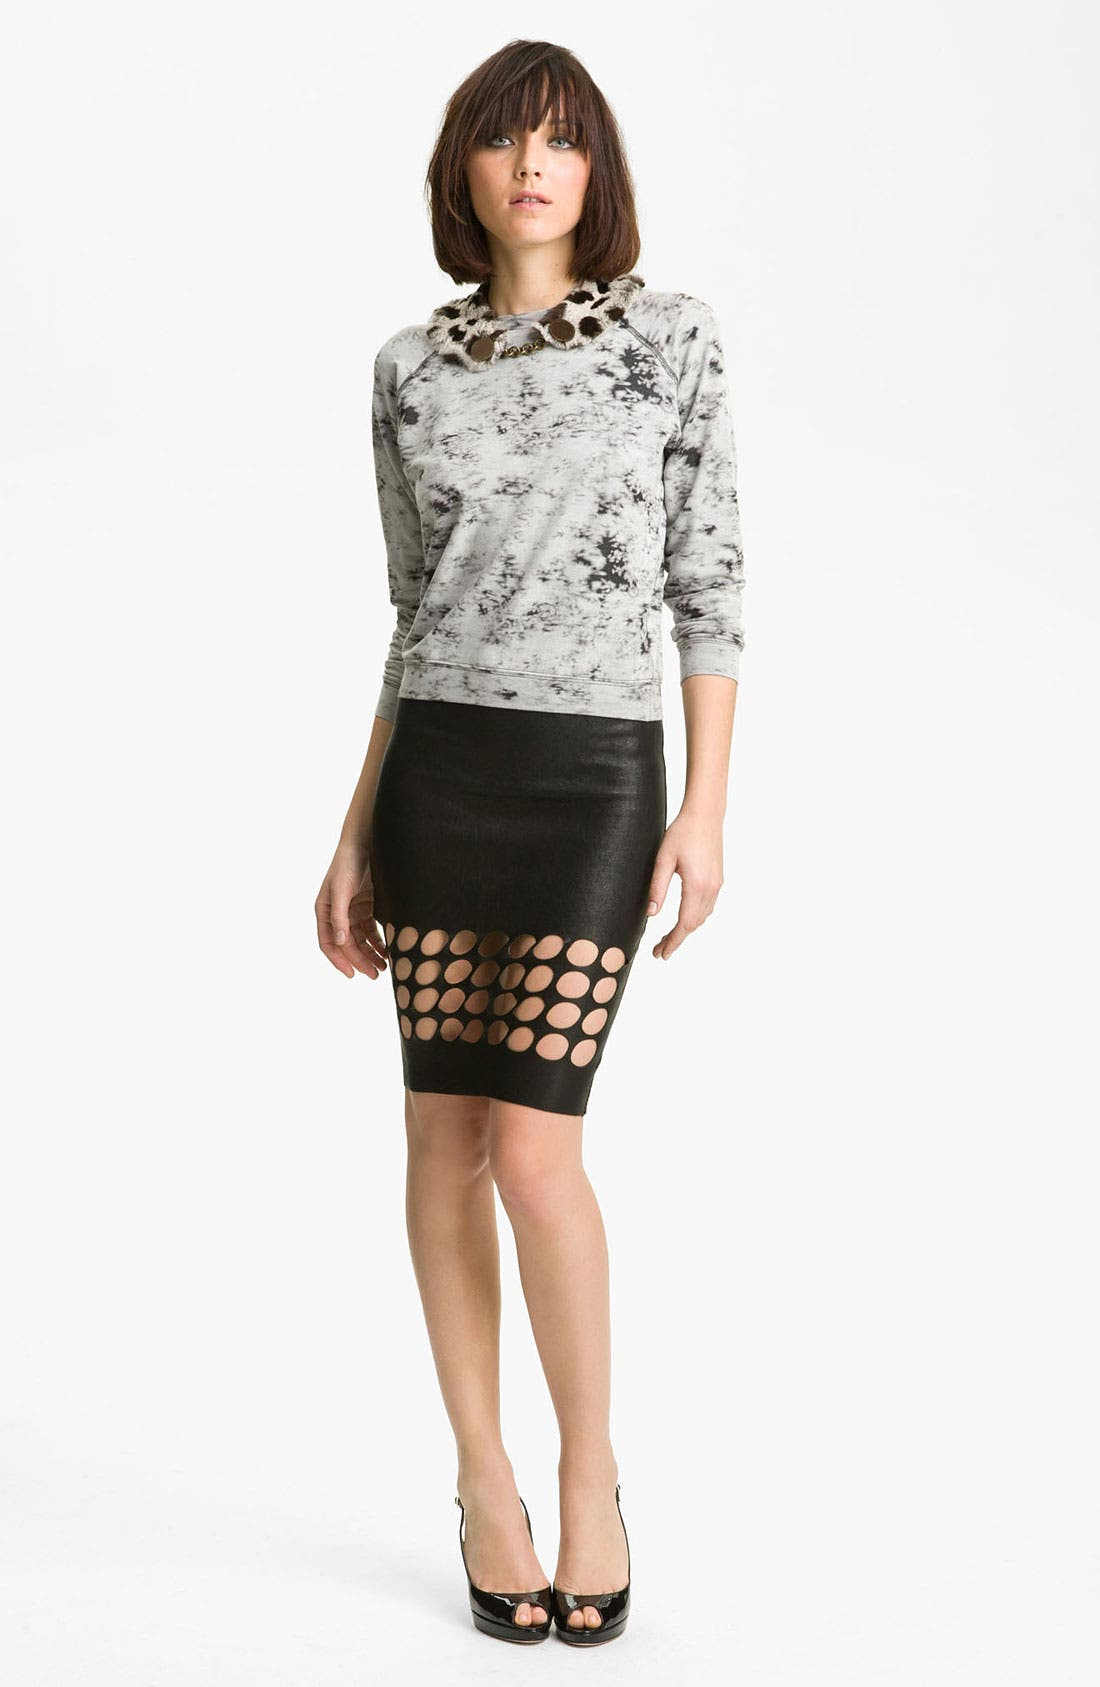 Alternate Image 1 Selected - Kelly Wearstler 'Priscilla' Sweatshirt with Removable Rabbit Fur Collar